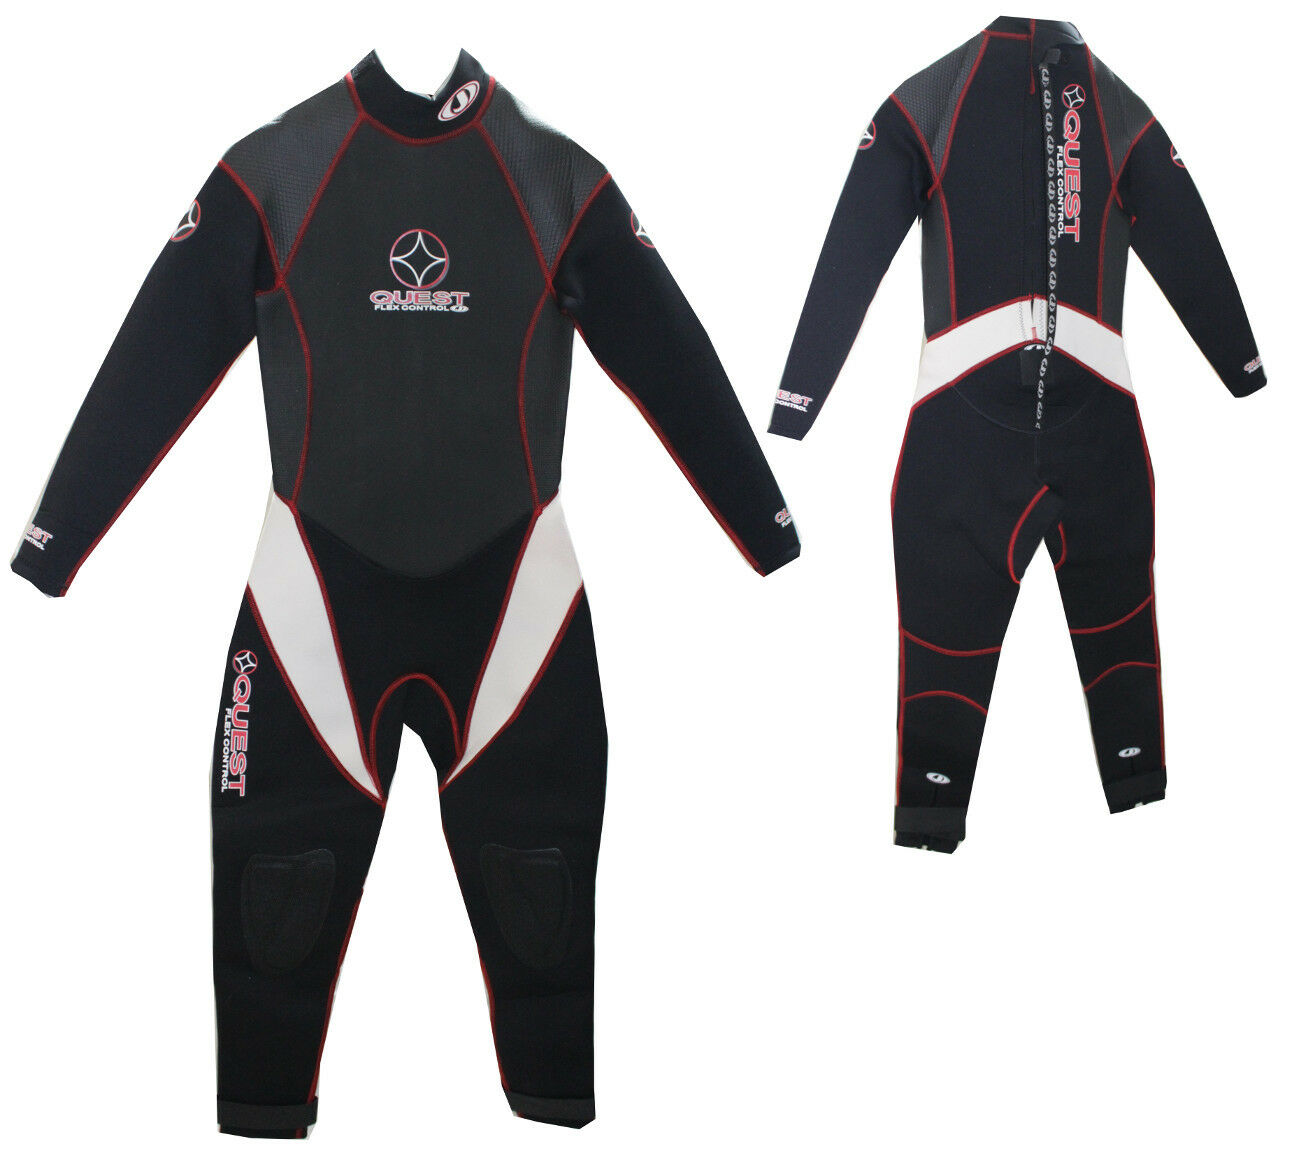 JOBE Full Full JOBE Suit QUEST Neopenanzug Surfen Kiten Wakeboard Wasserski Jetski NEU N 1 bfbb26